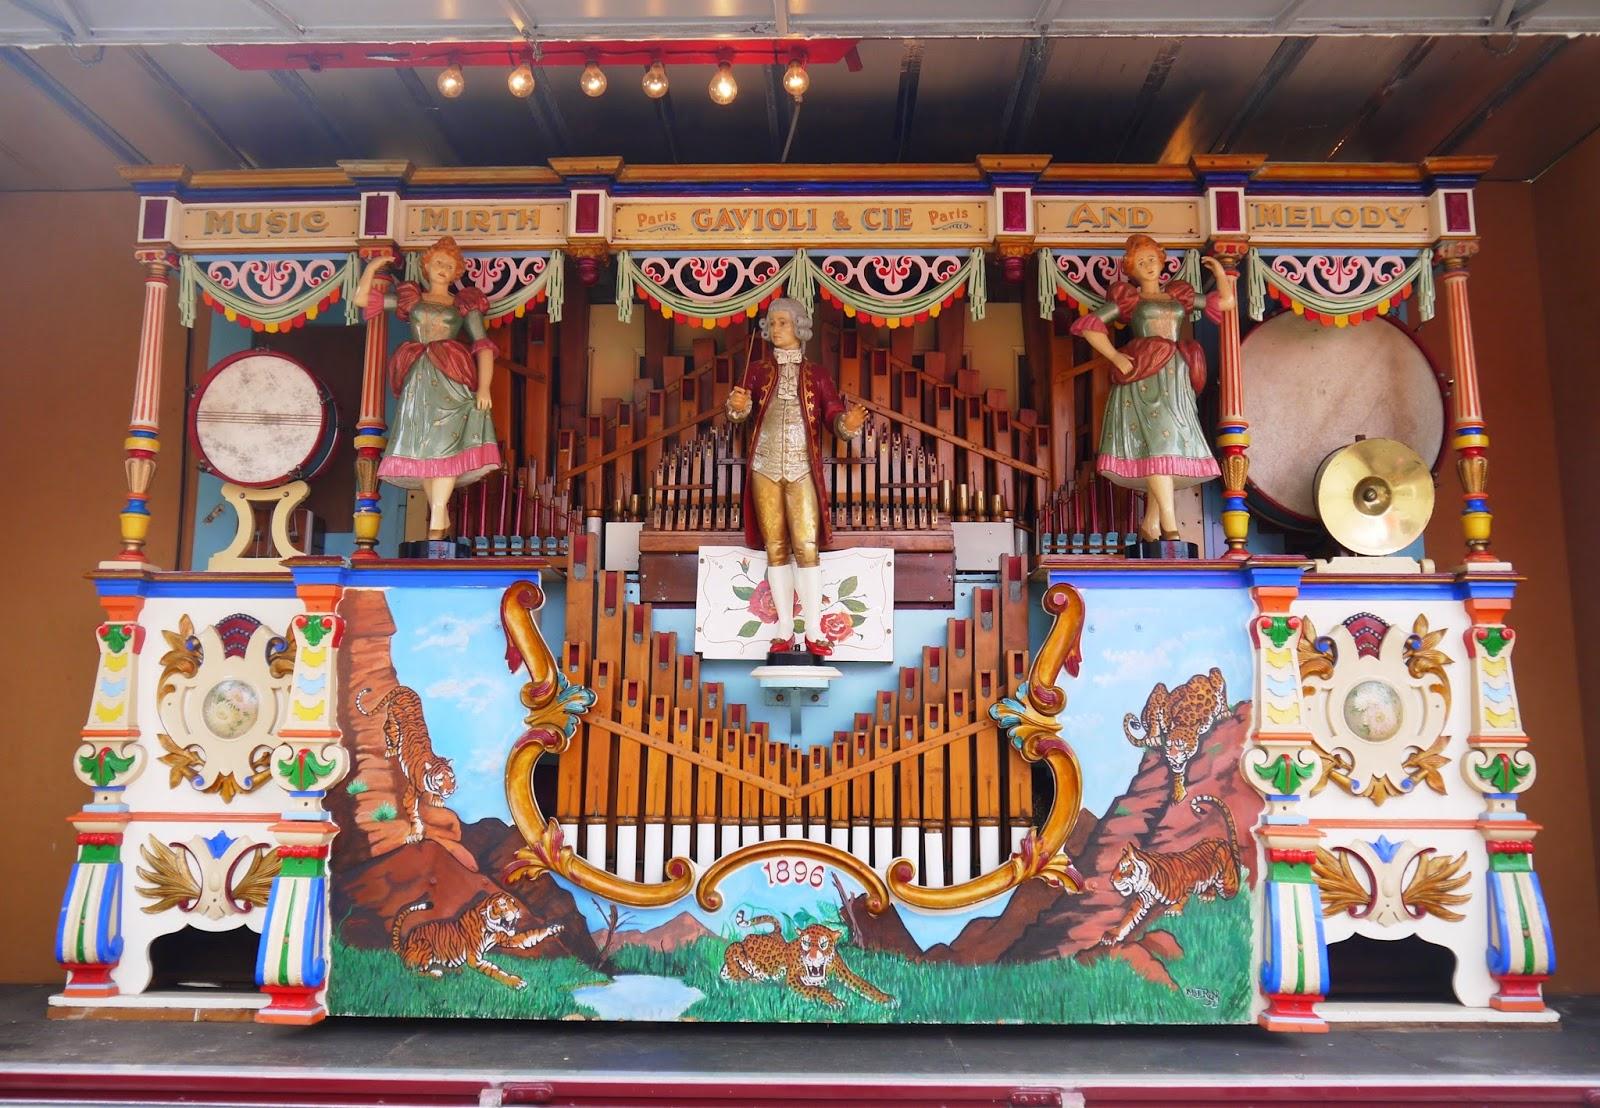 1896 fairground organ